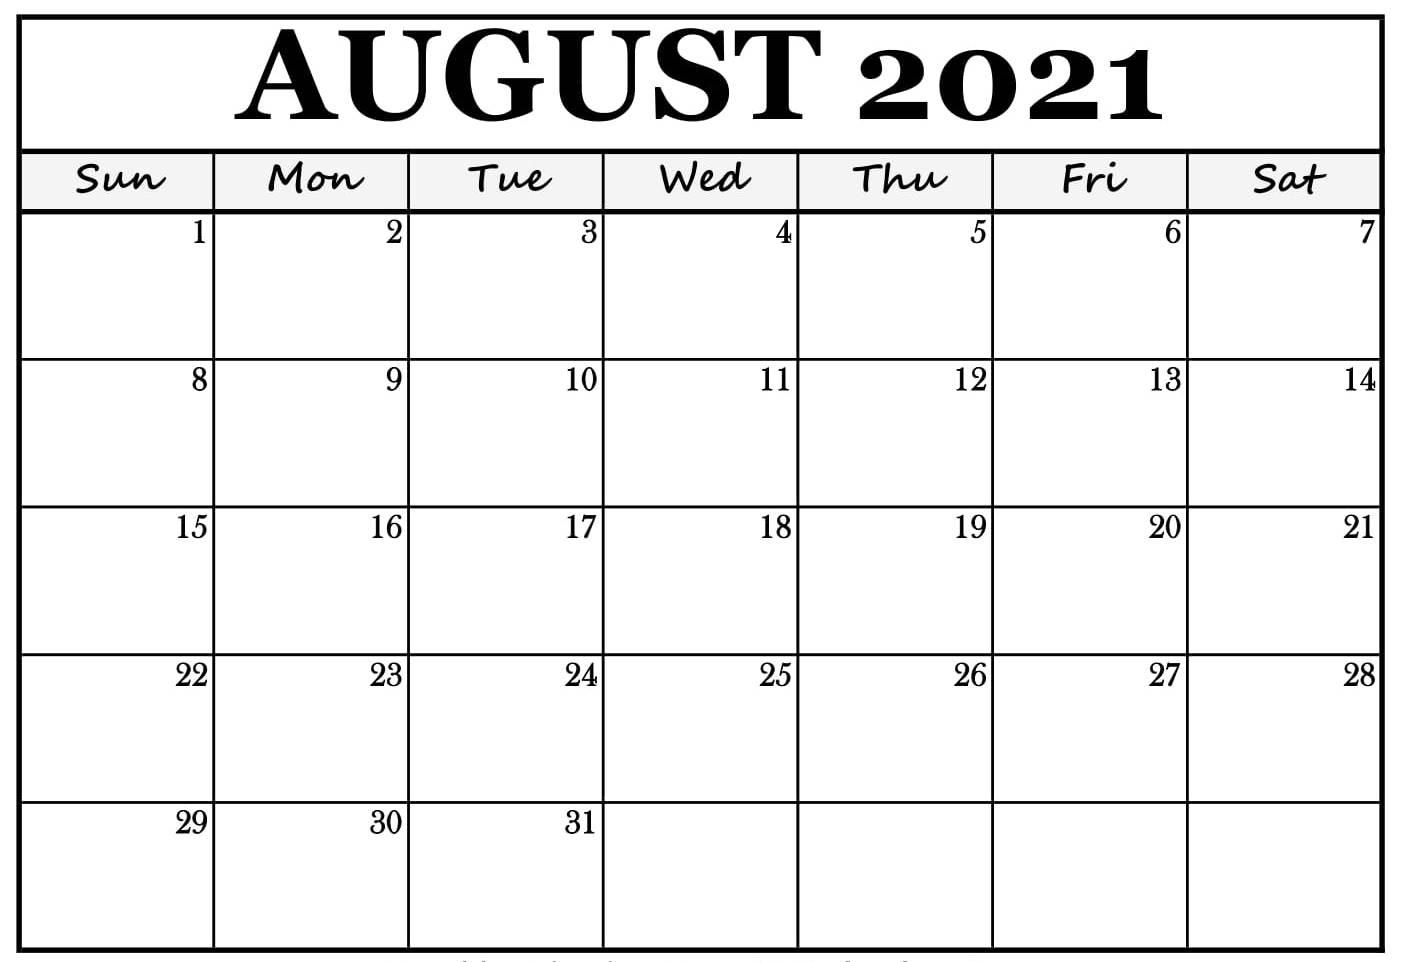 August Calendar For 2021